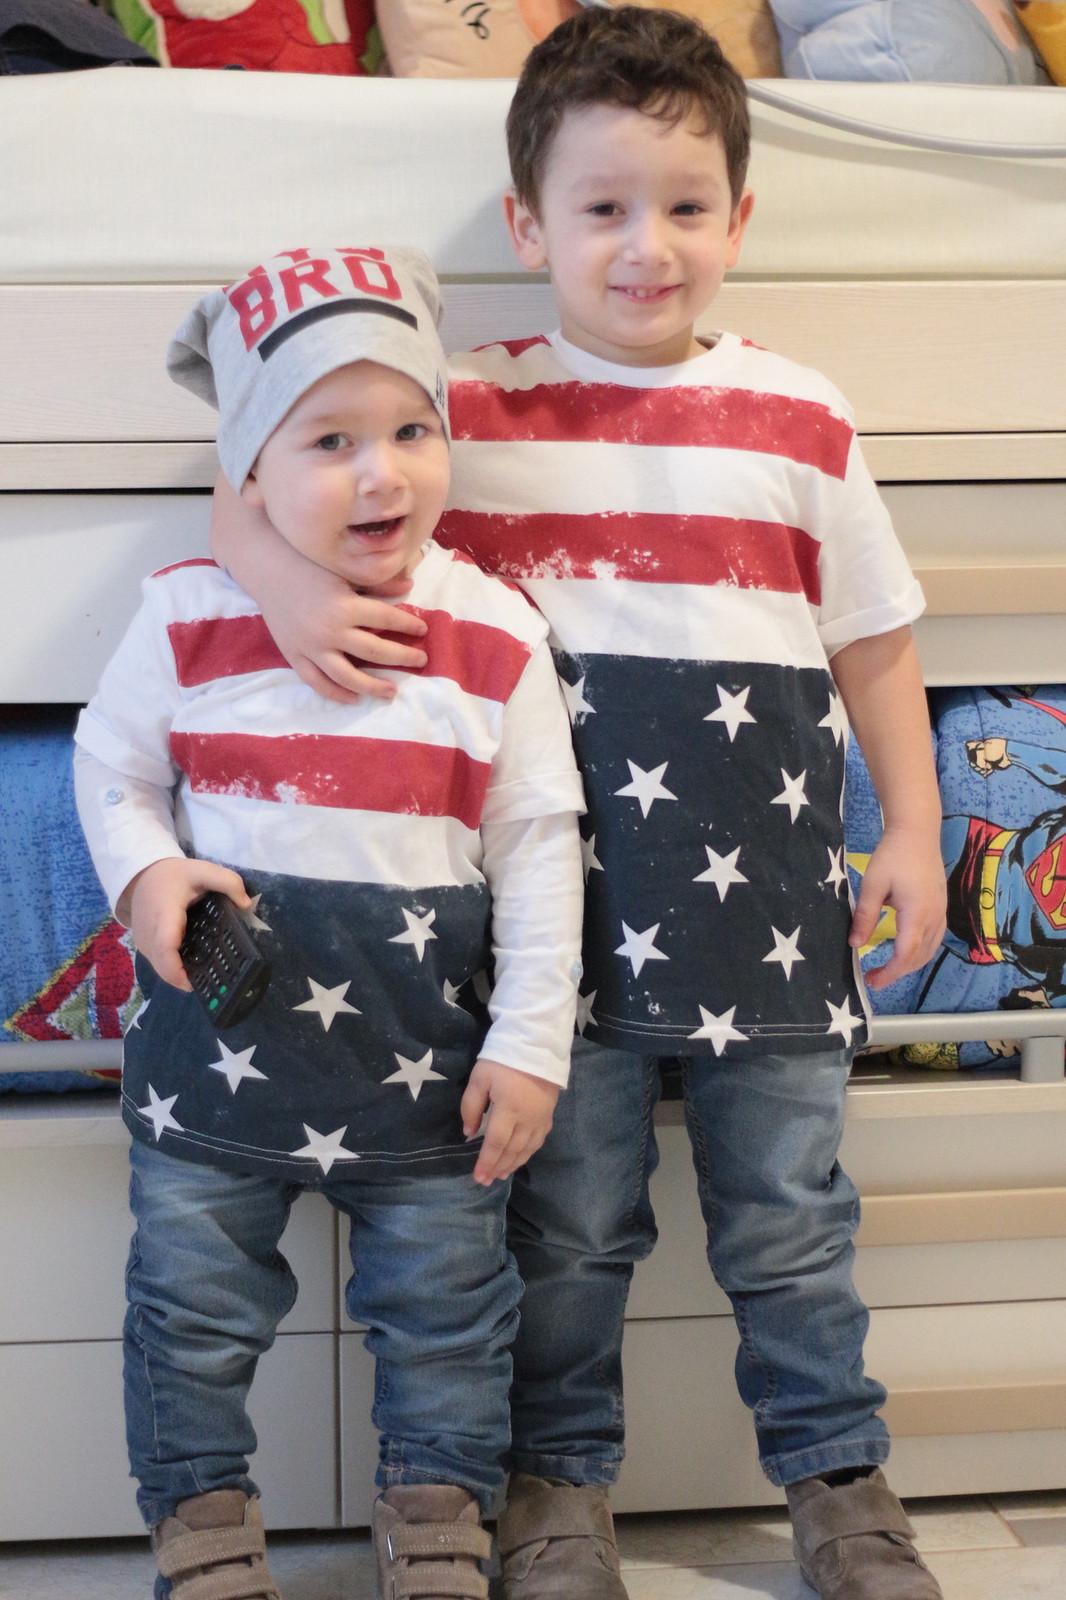 Outfit uguali per bimbi diversi - Terranova shopping